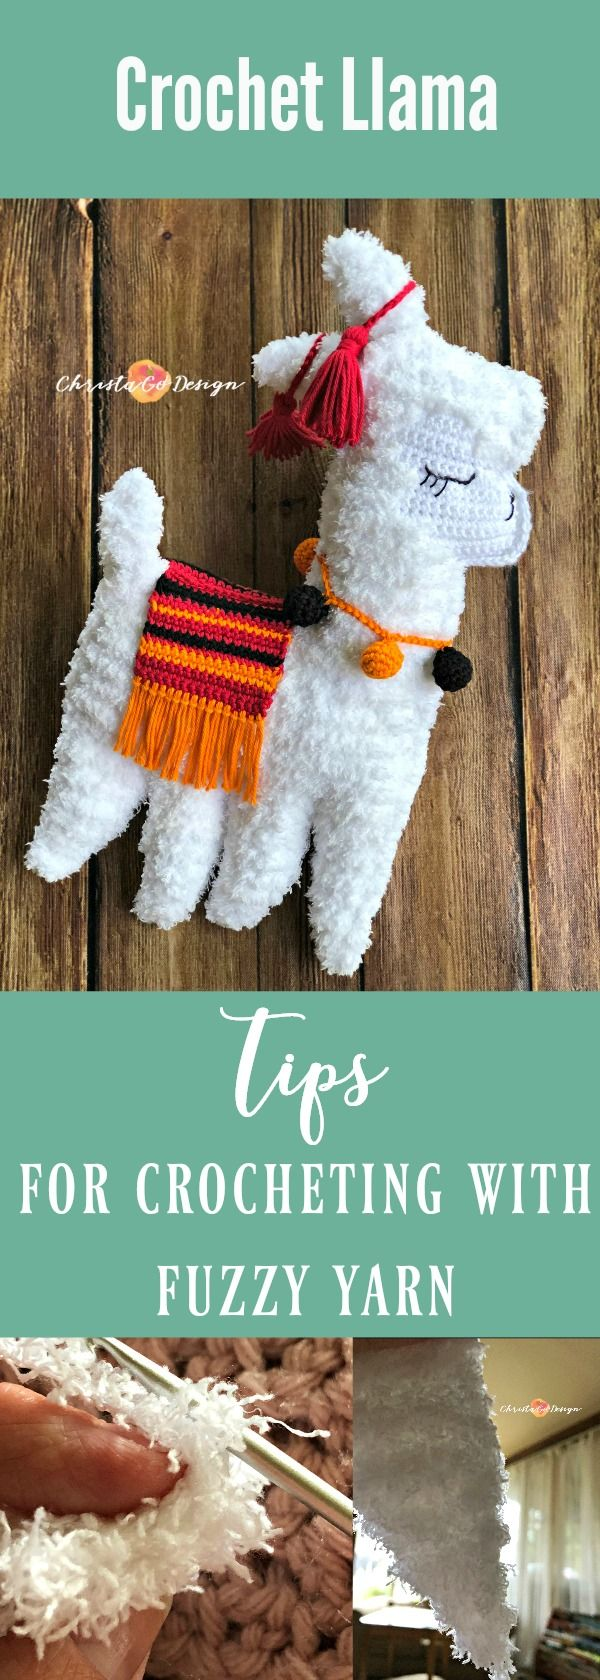 2119 best crochet doll images on Pinterest | Amigurumi patterns ...